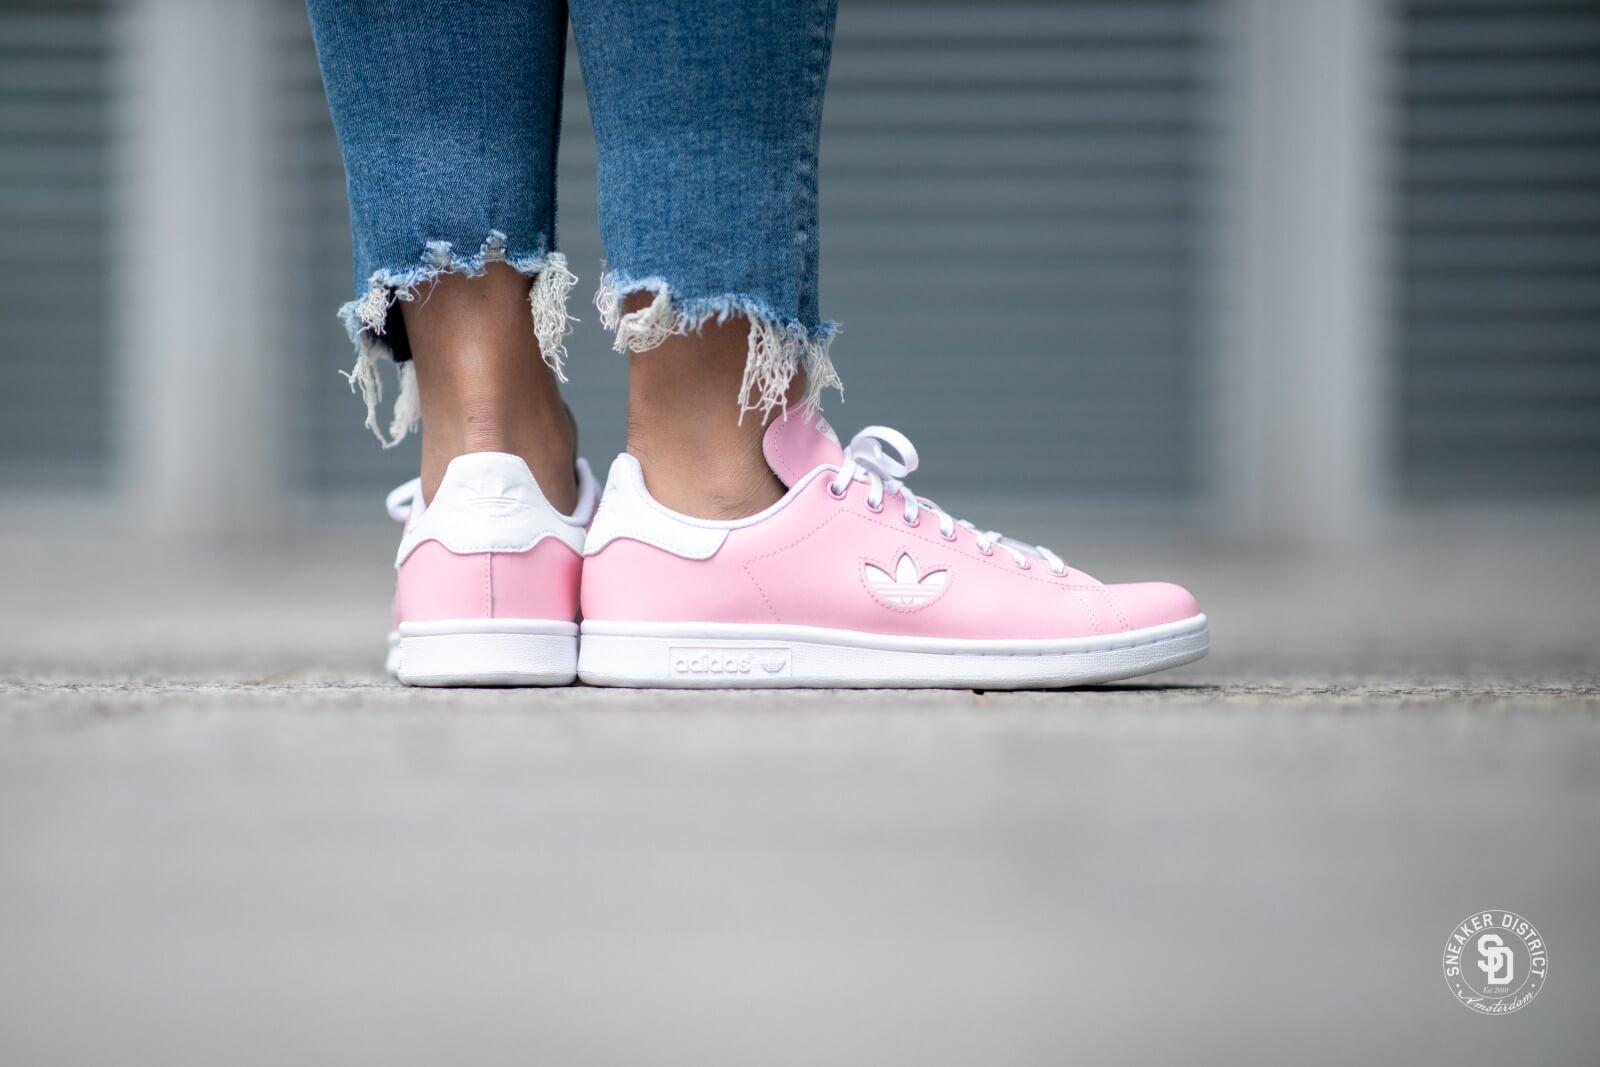 Adidas Stan Smith Light Pink/White - CG6670